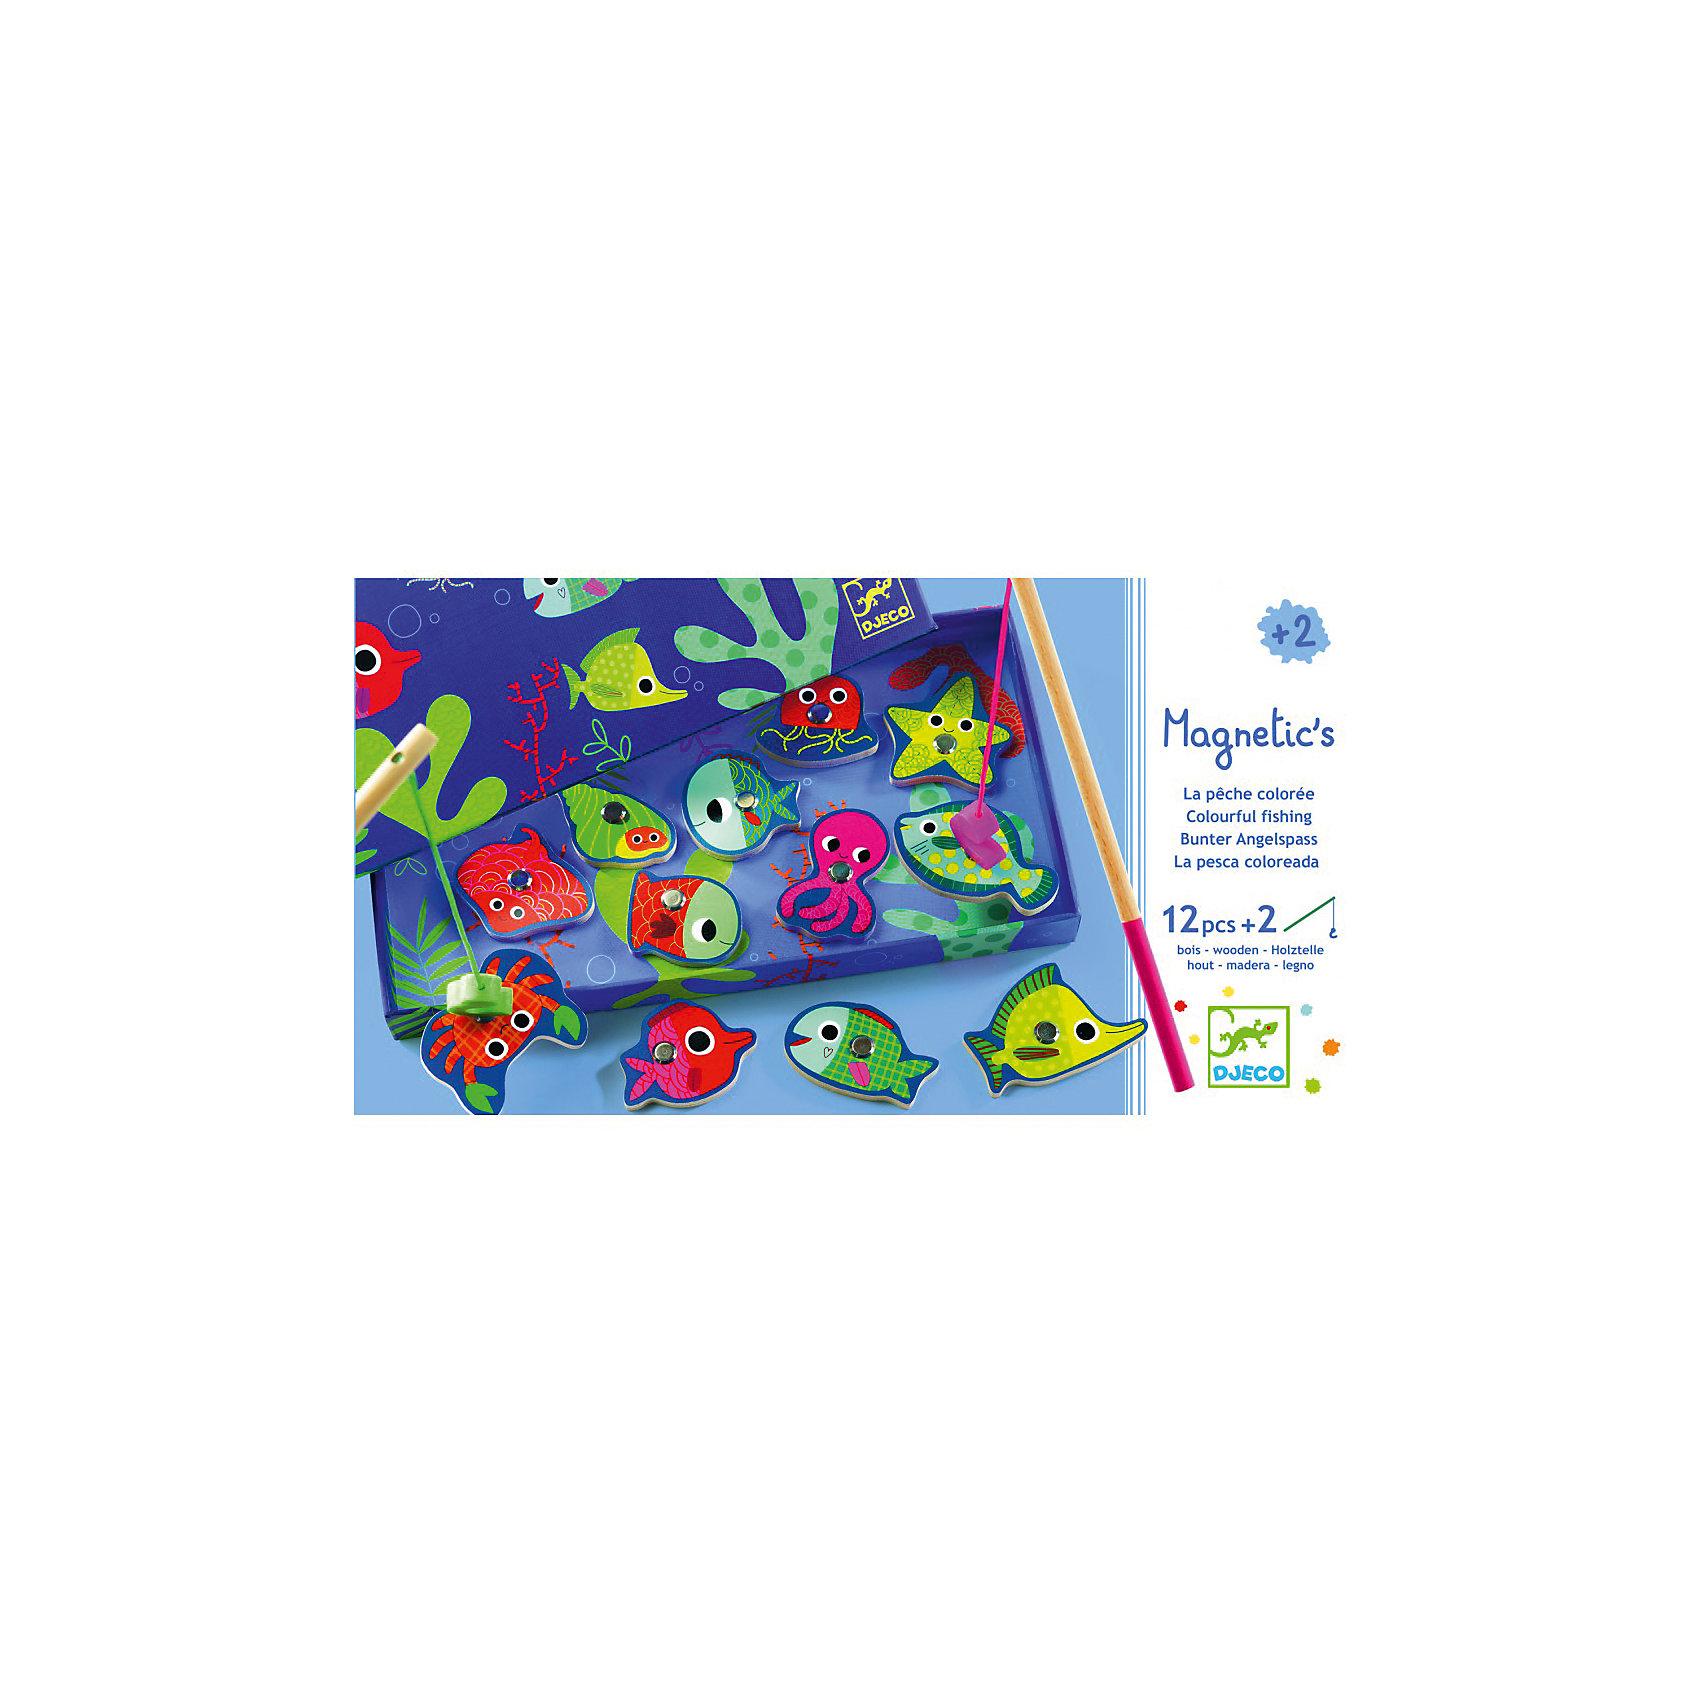 Магнитная игра рыбалка Цвета, DJECO